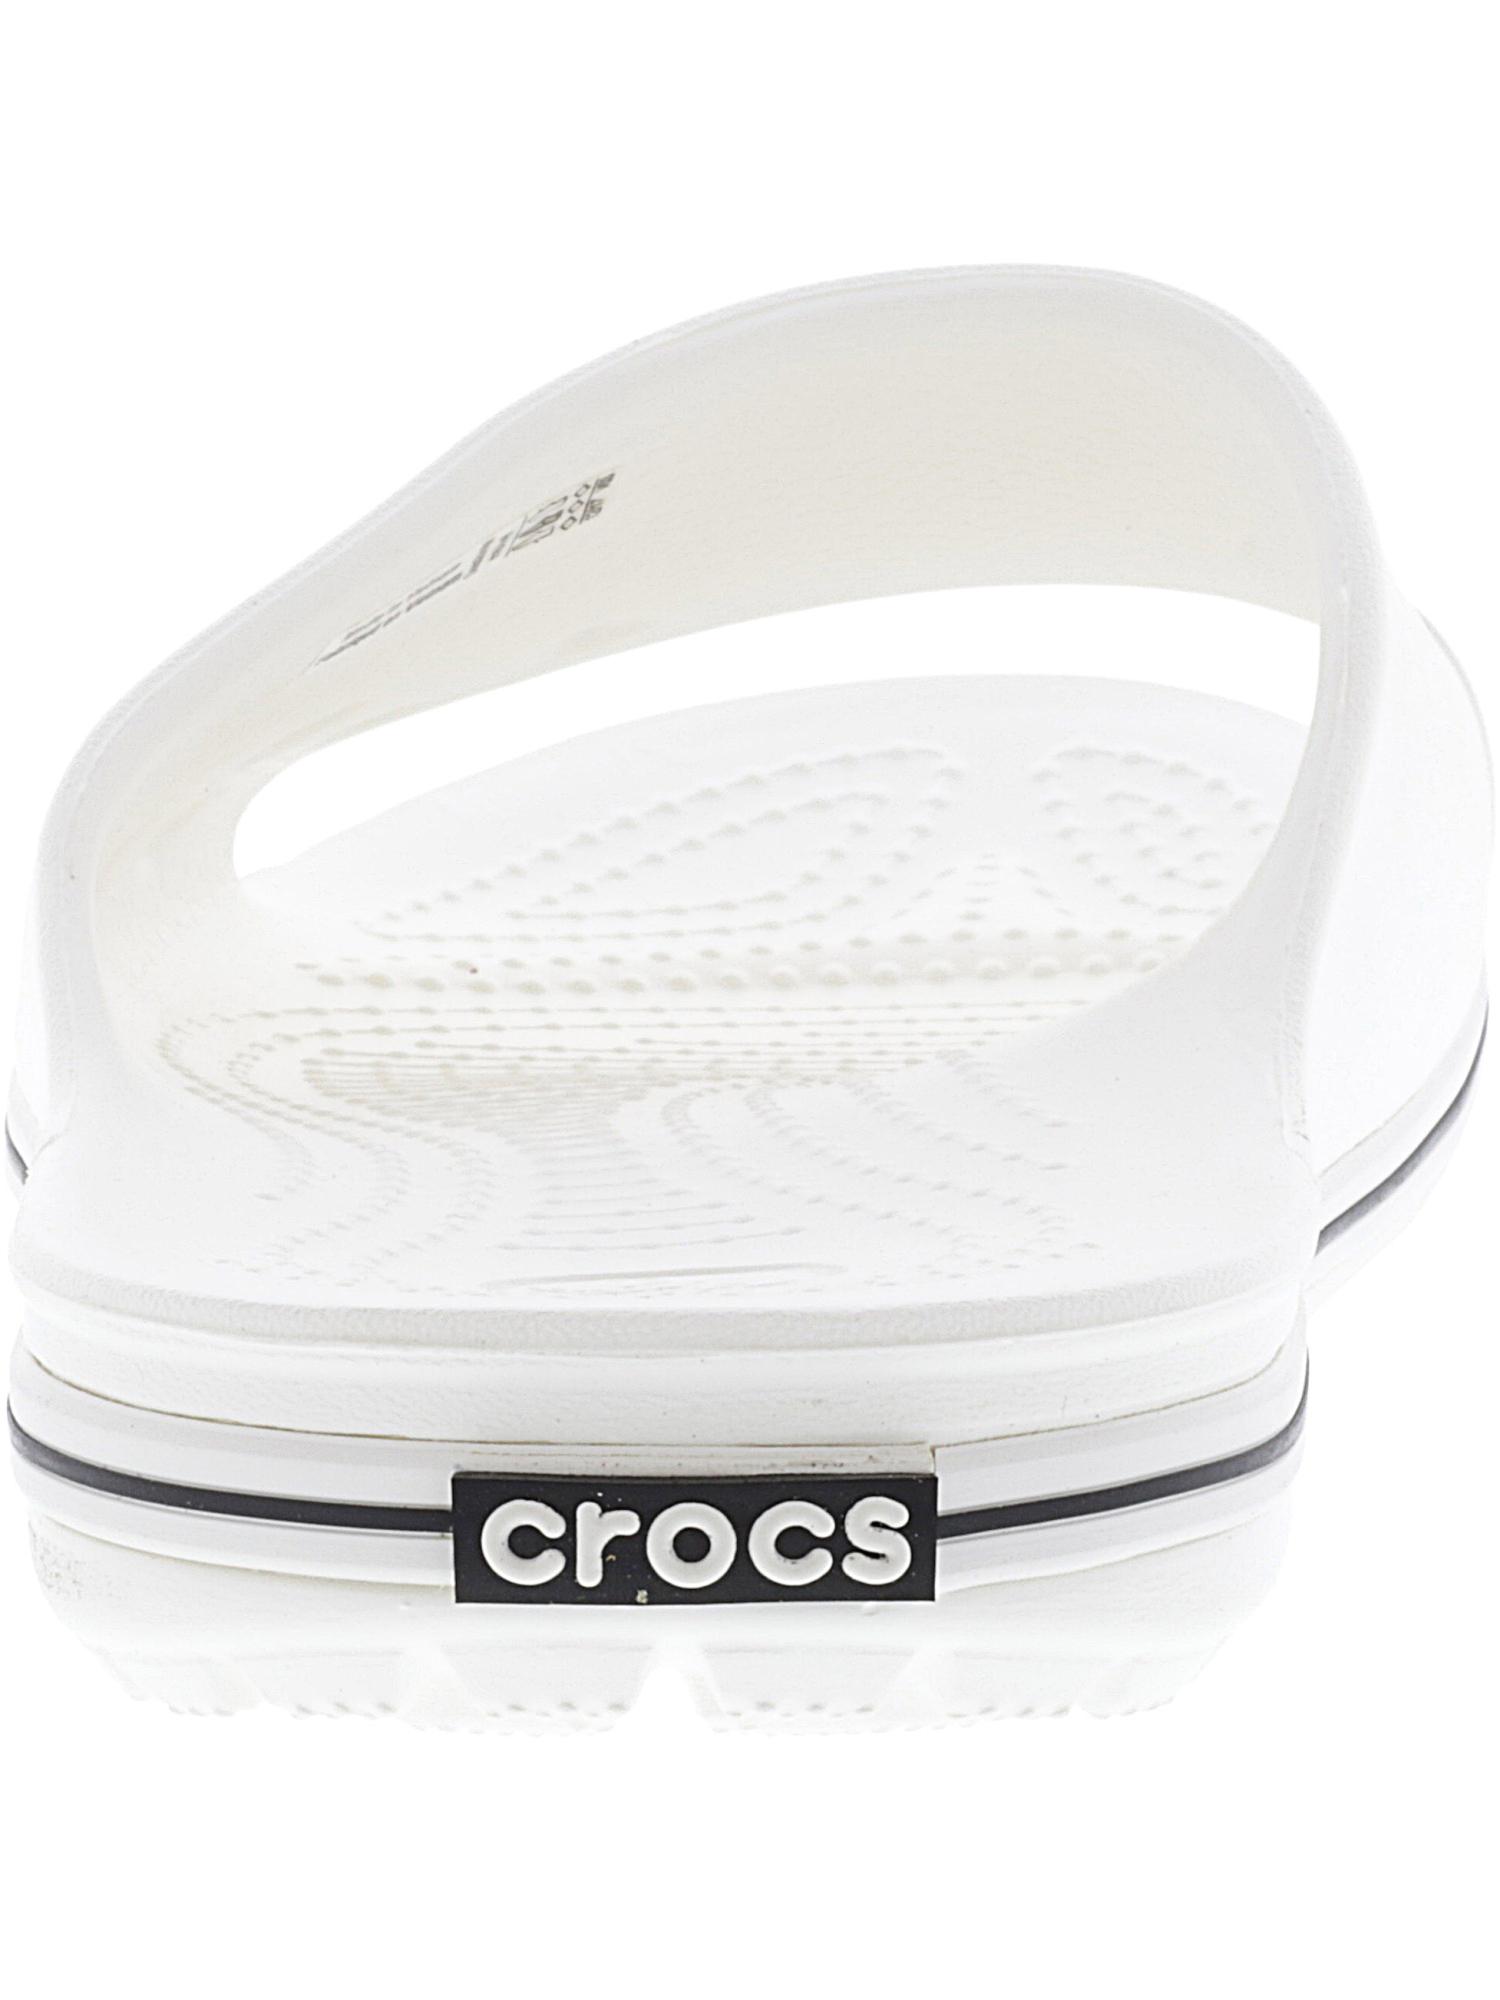 2a90867a26e3 Crocs Crocband II Slide White   Black Sandal - 6m 4m for sale online ...